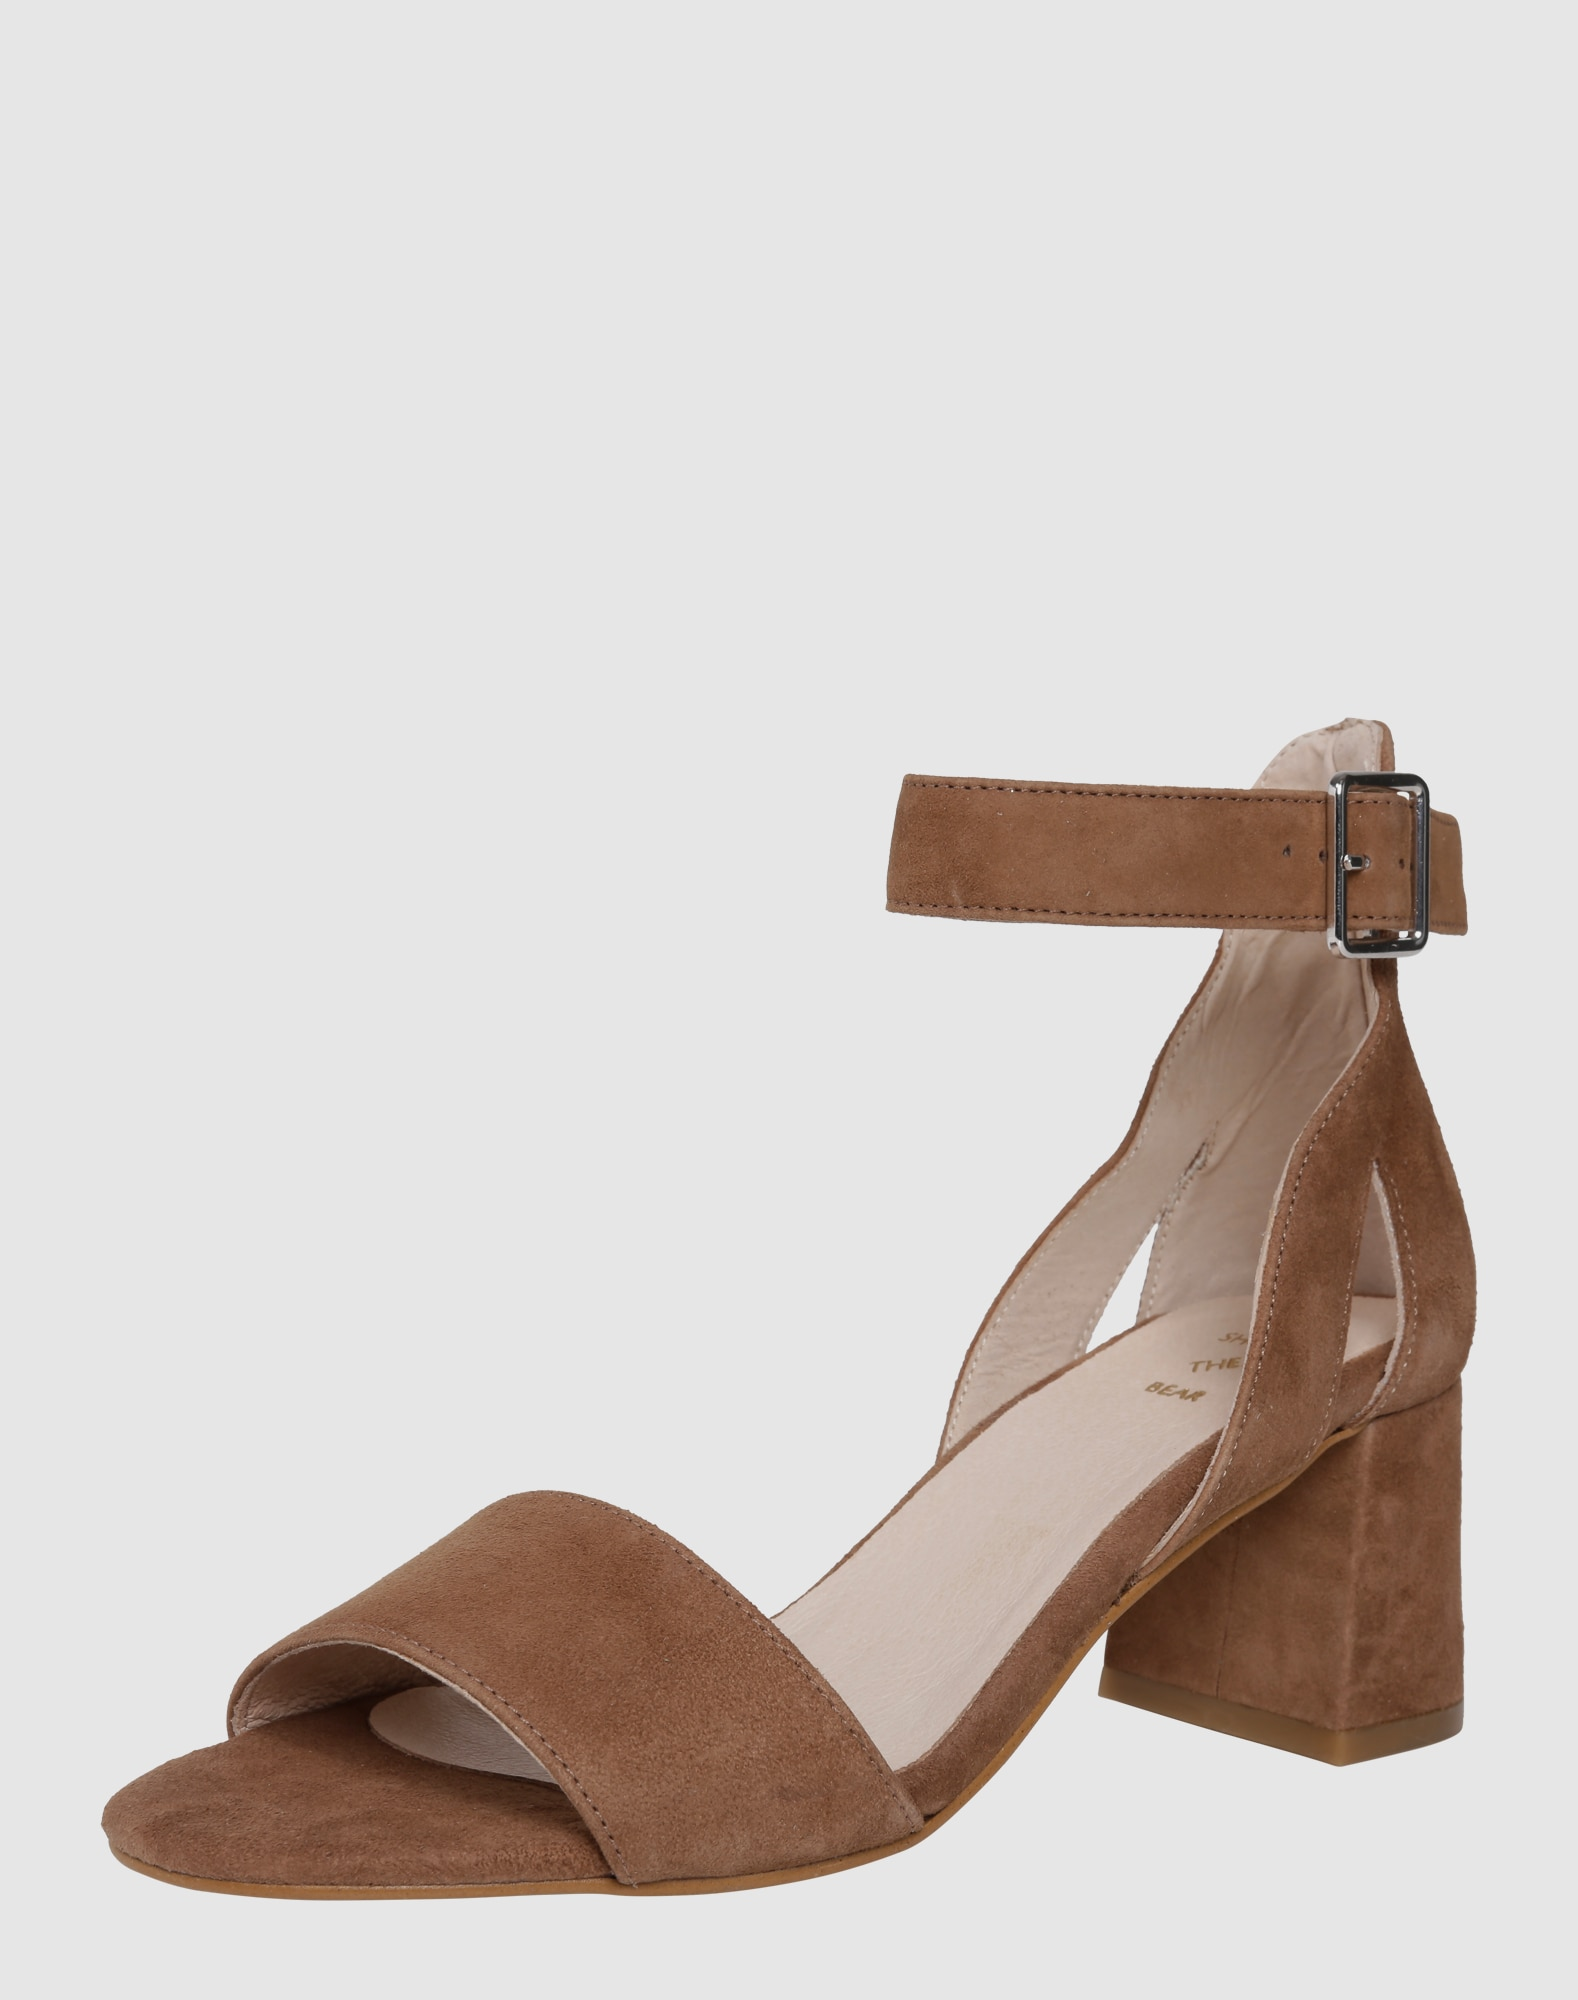 shoe the bear sandalen mit blockabsatz 39 may s 39 in braun. Black Bedroom Furniture Sets. Home Design Ideas